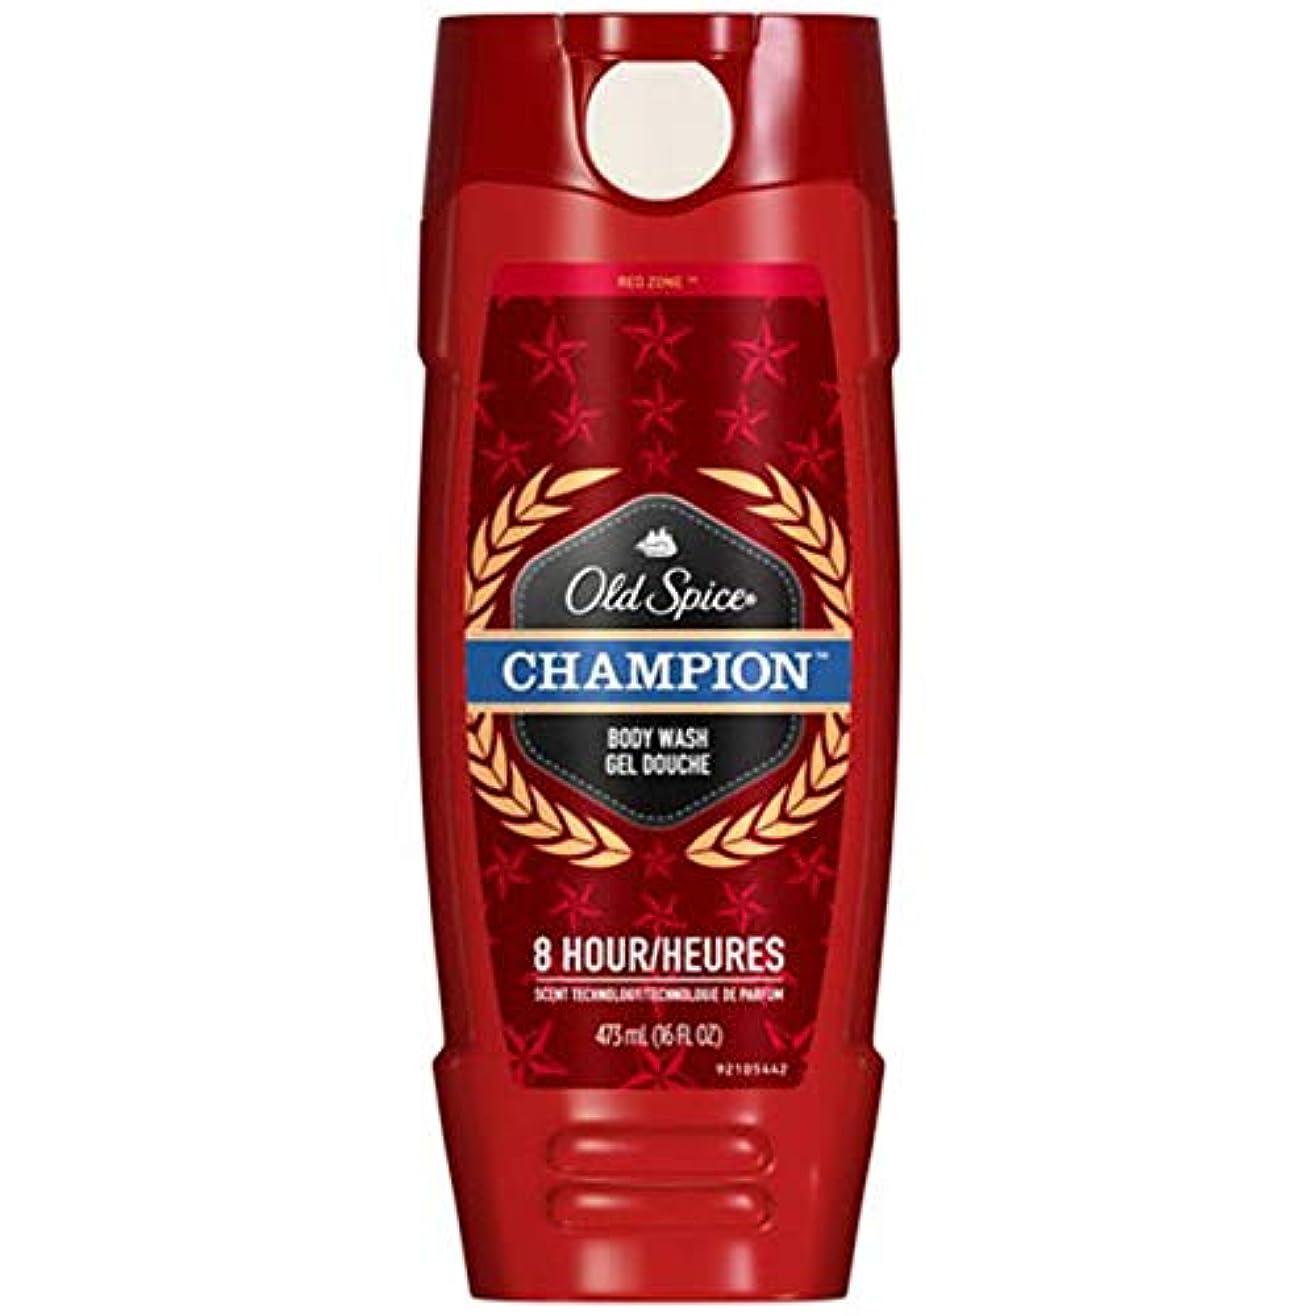 Old Spice オールドスパイス ボディーウォッシュジェル Red Zone Body Wash GEL 473ml 並行輸入品 (CHAMPION/チャンピオン) [並行輸入品]